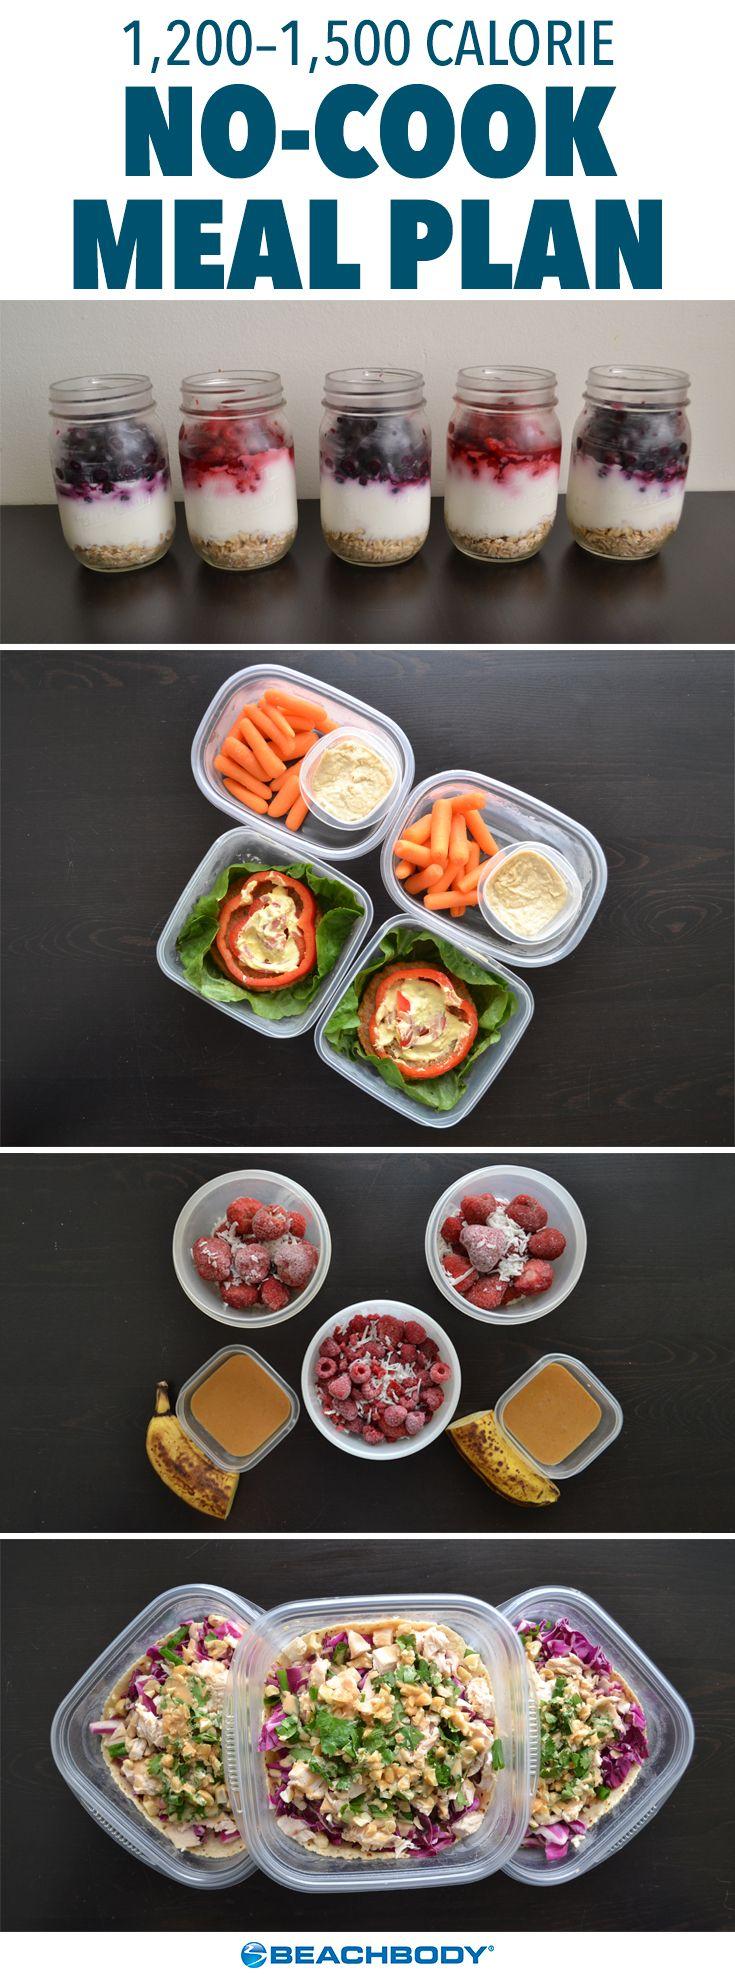 1 200 calorie meal plan eating clean pinterest repas alimentation et repas semaine. Black Bedroom Furniture Sets. Home Design Ideas